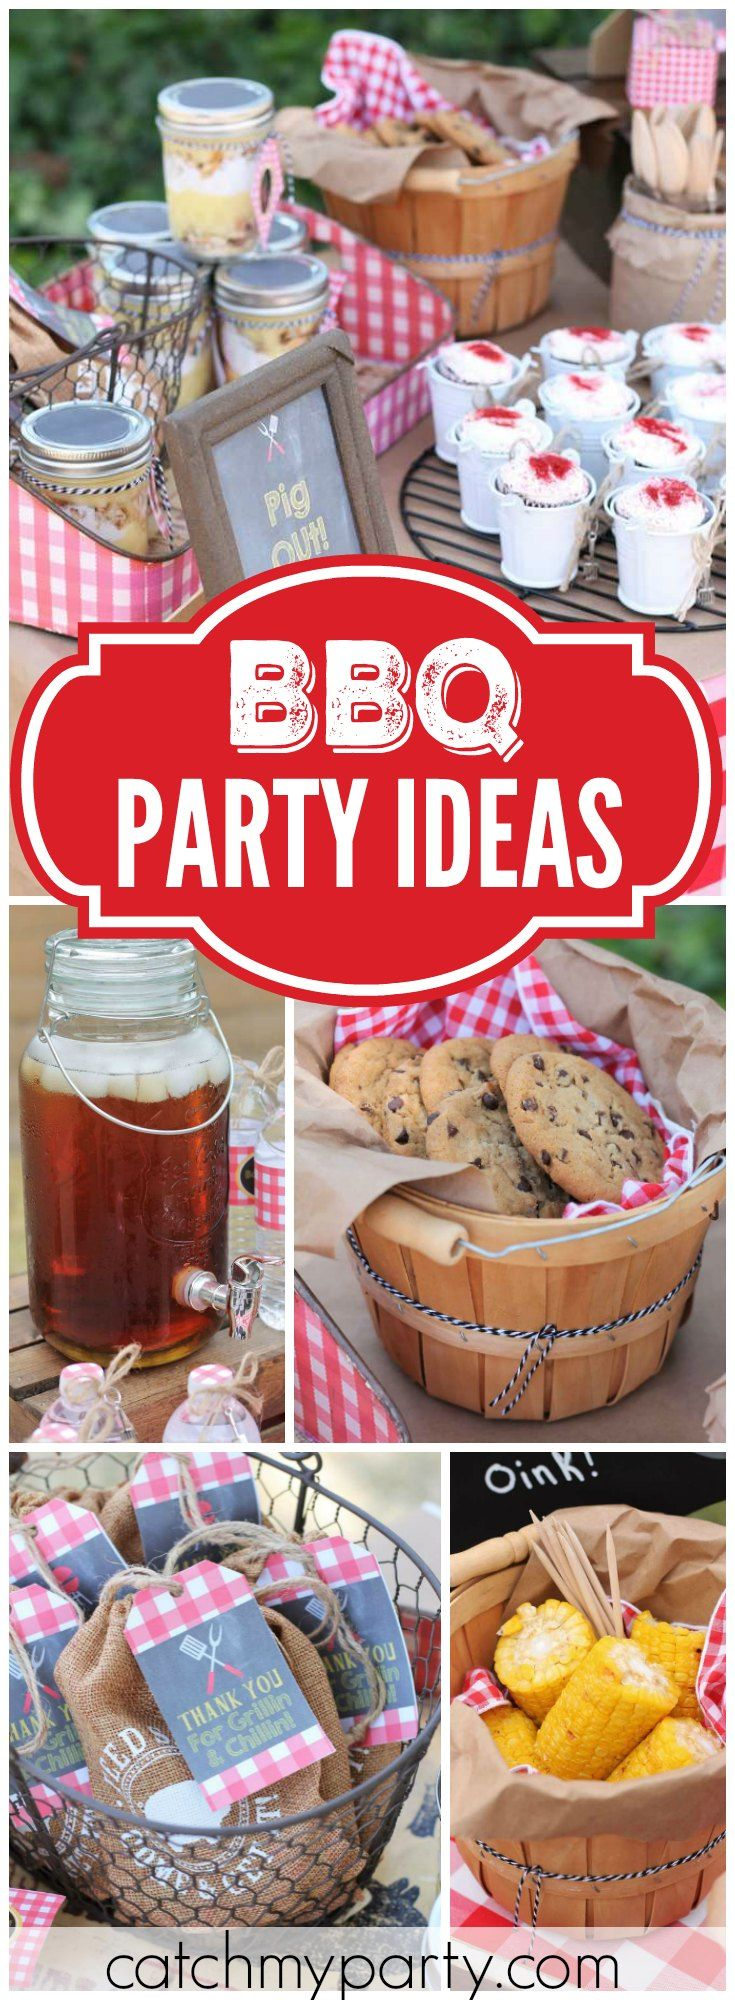 Best 25+ Backyard bbq ideas on Pinterest | Bbq party ...